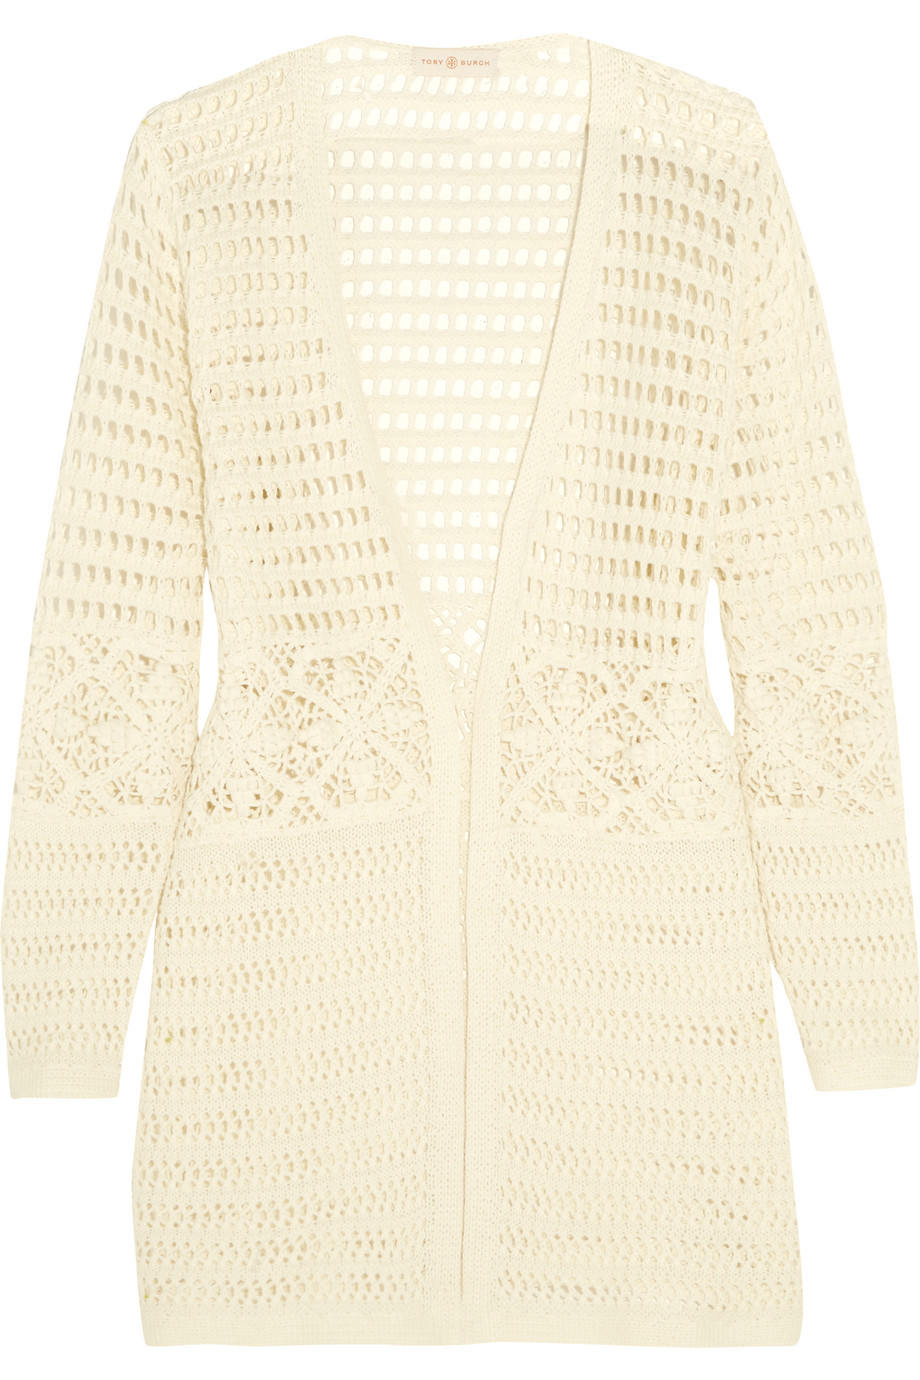 Tory Burch Nerano Crocheted Cotton Robe, Ivory, Women's, Size: XS